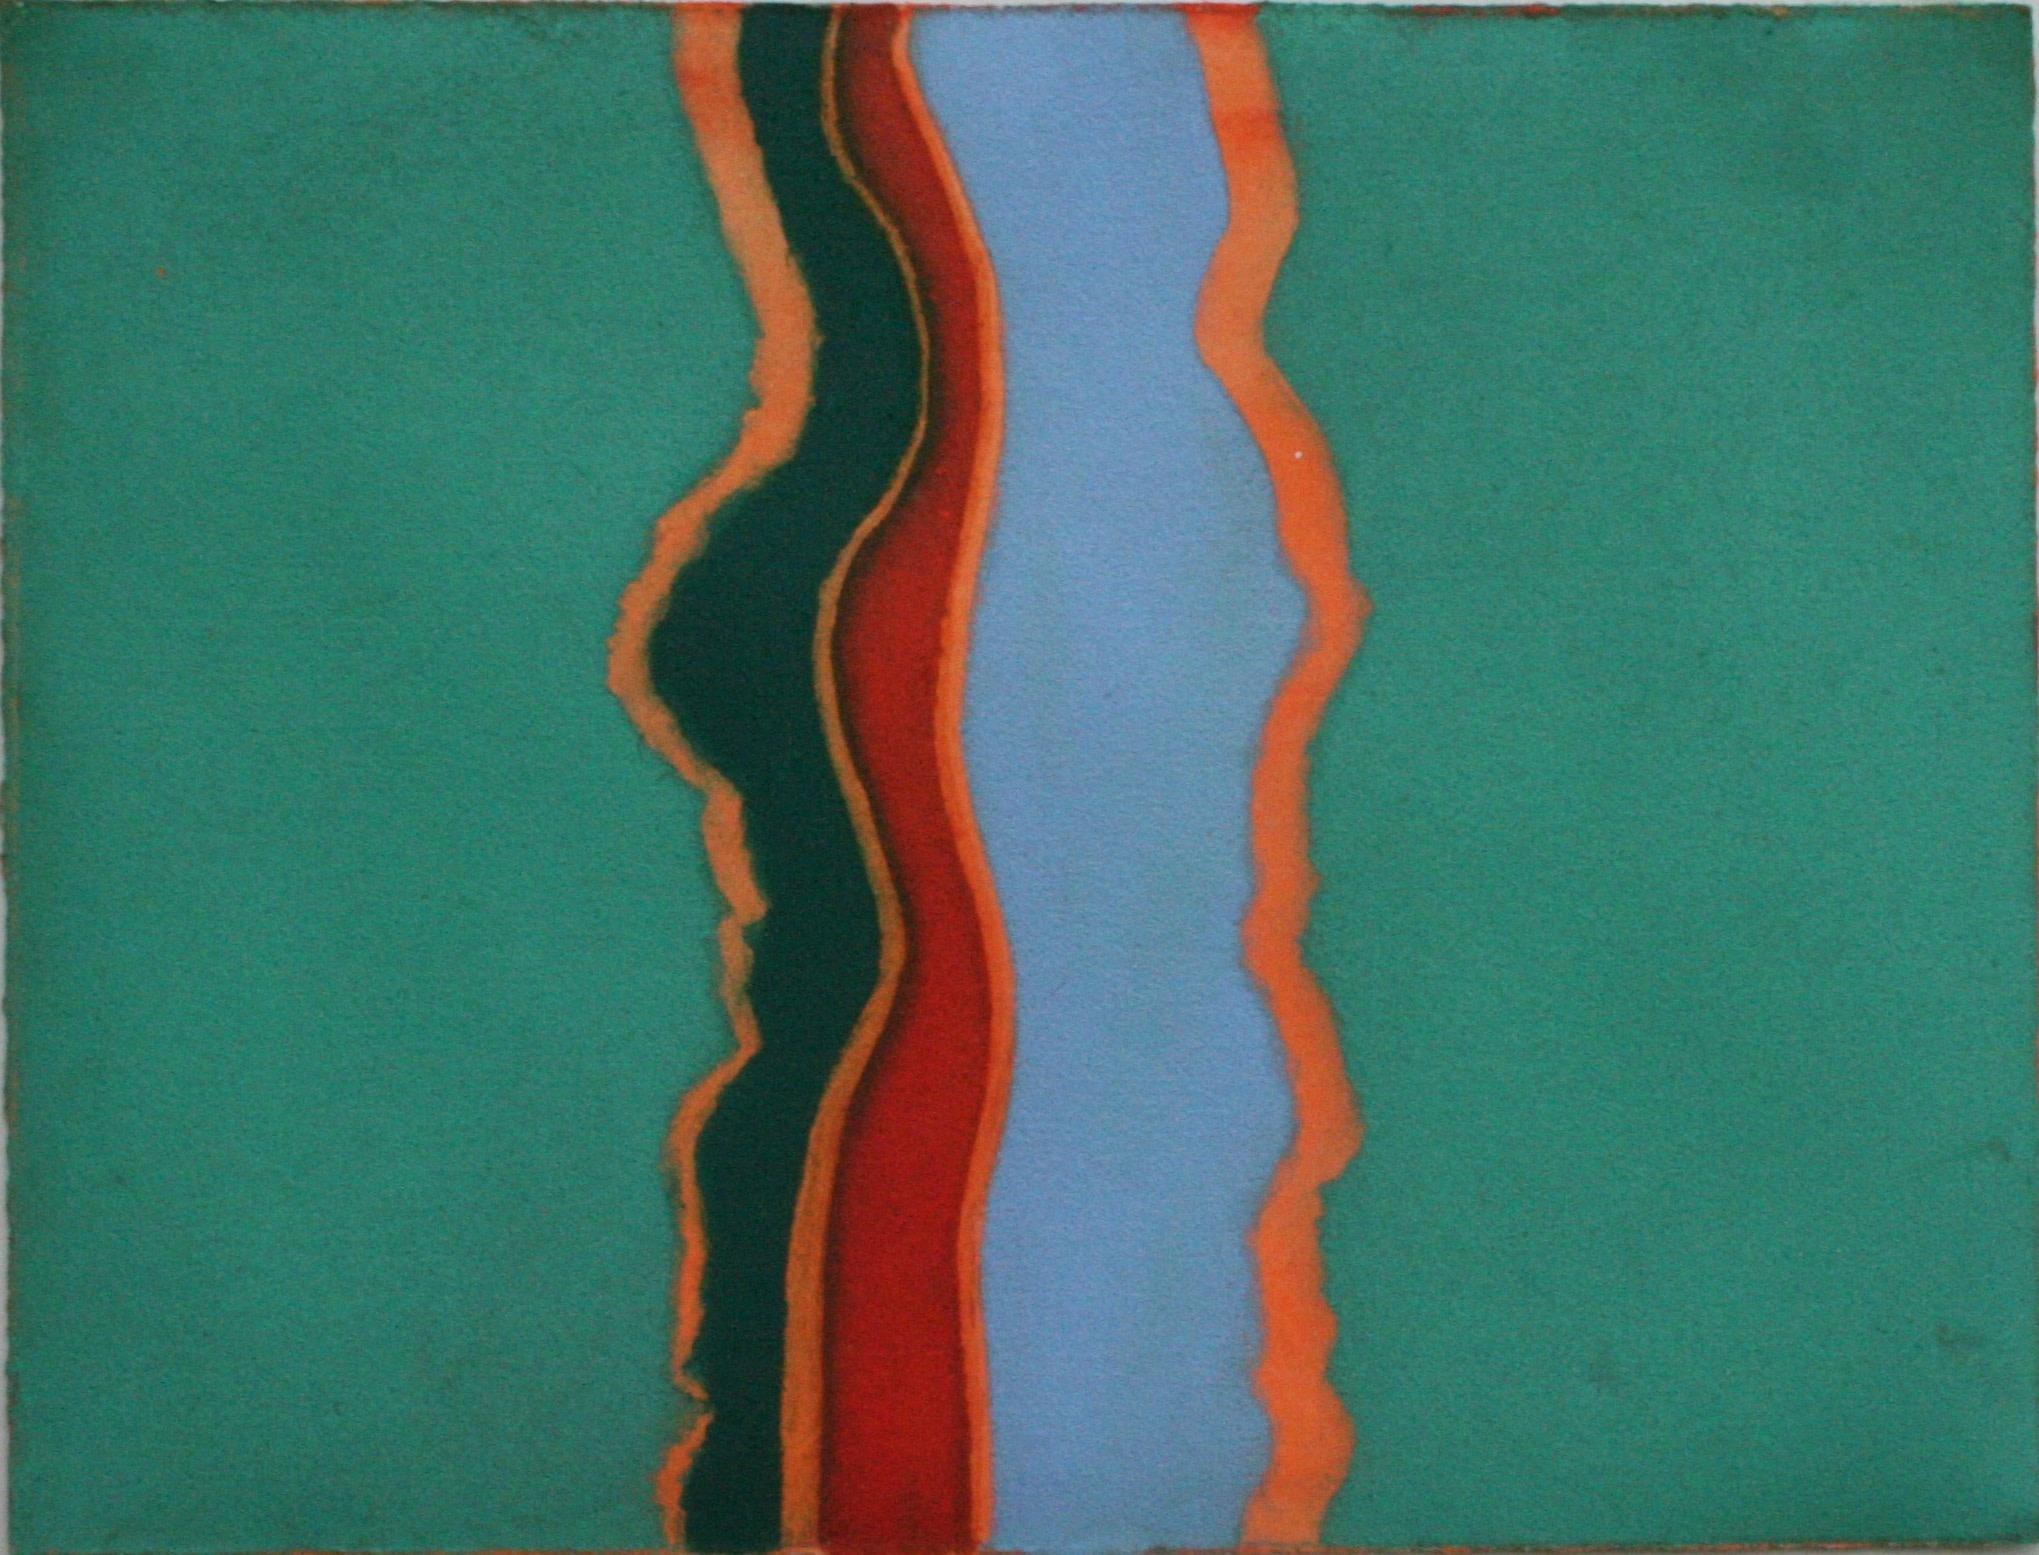 "<span class=""link fancybox-details-link""><a href=""/exhibitions/20/works/artworks_standalone10826/"">View Detail Page</a></span><div class=""artist""><span class=""artist""><strong>Ursula Leach RE</strong></span></div><div class=""title""><em>Crossing</em></div><div class=""medium"">carborundum and hand colouring<br></div><div class=""dimensions"">23 x 31 cm image size<br></div><div class=""edition_details"">edition of 7</div>"